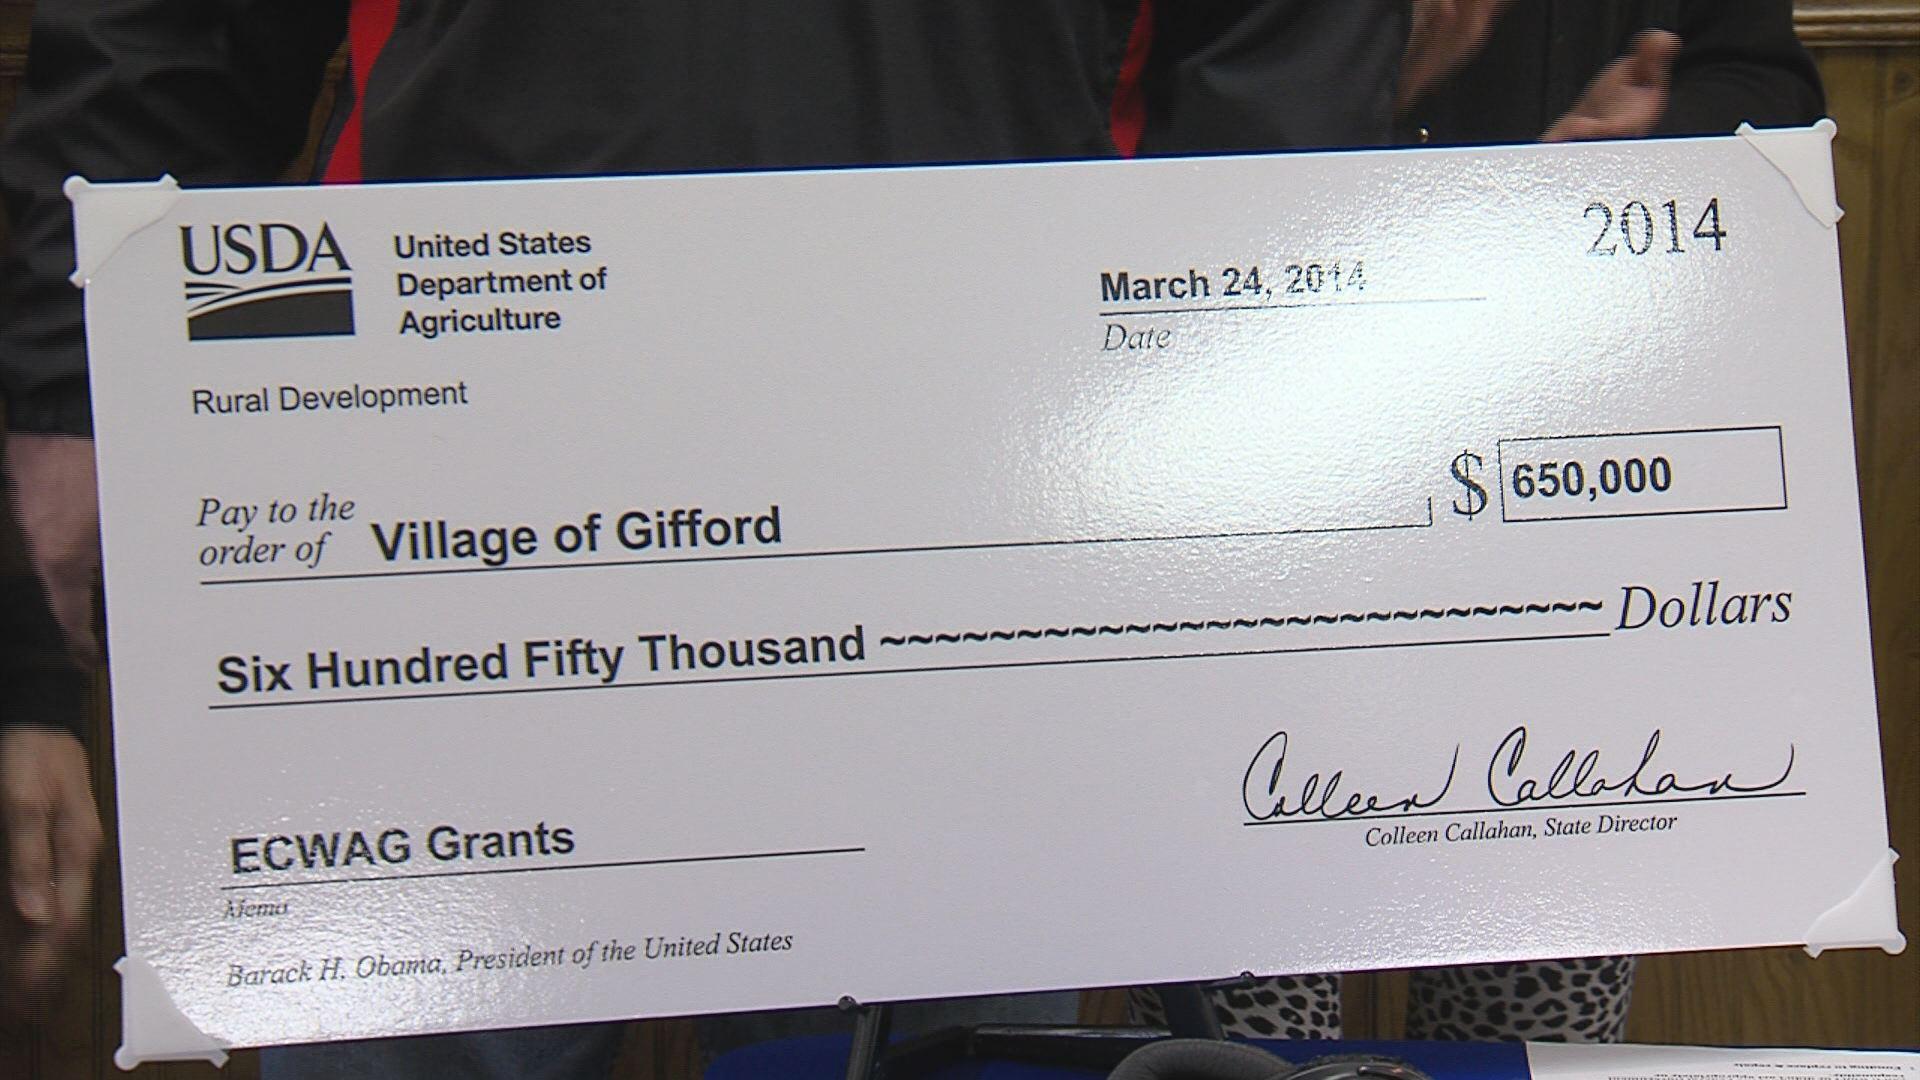 Government grants??